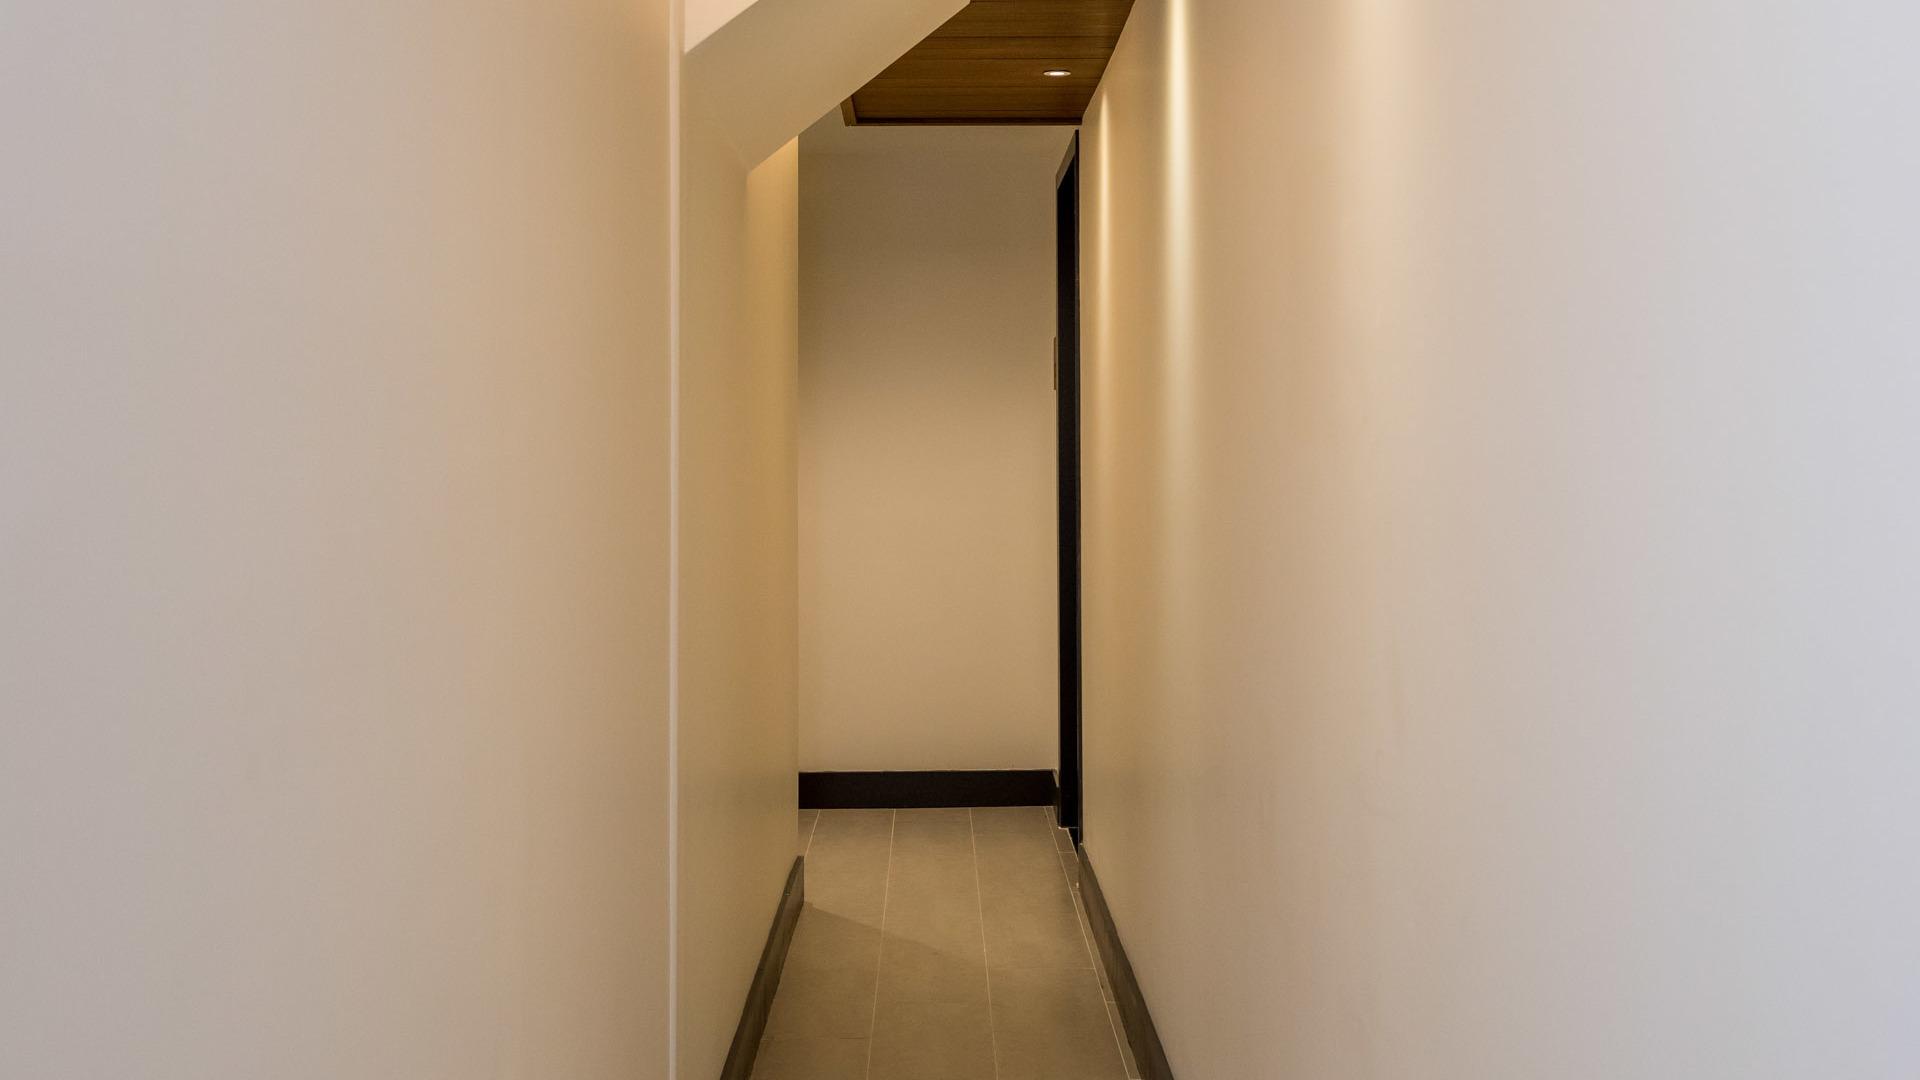 161 winthrop street interior first floor 4